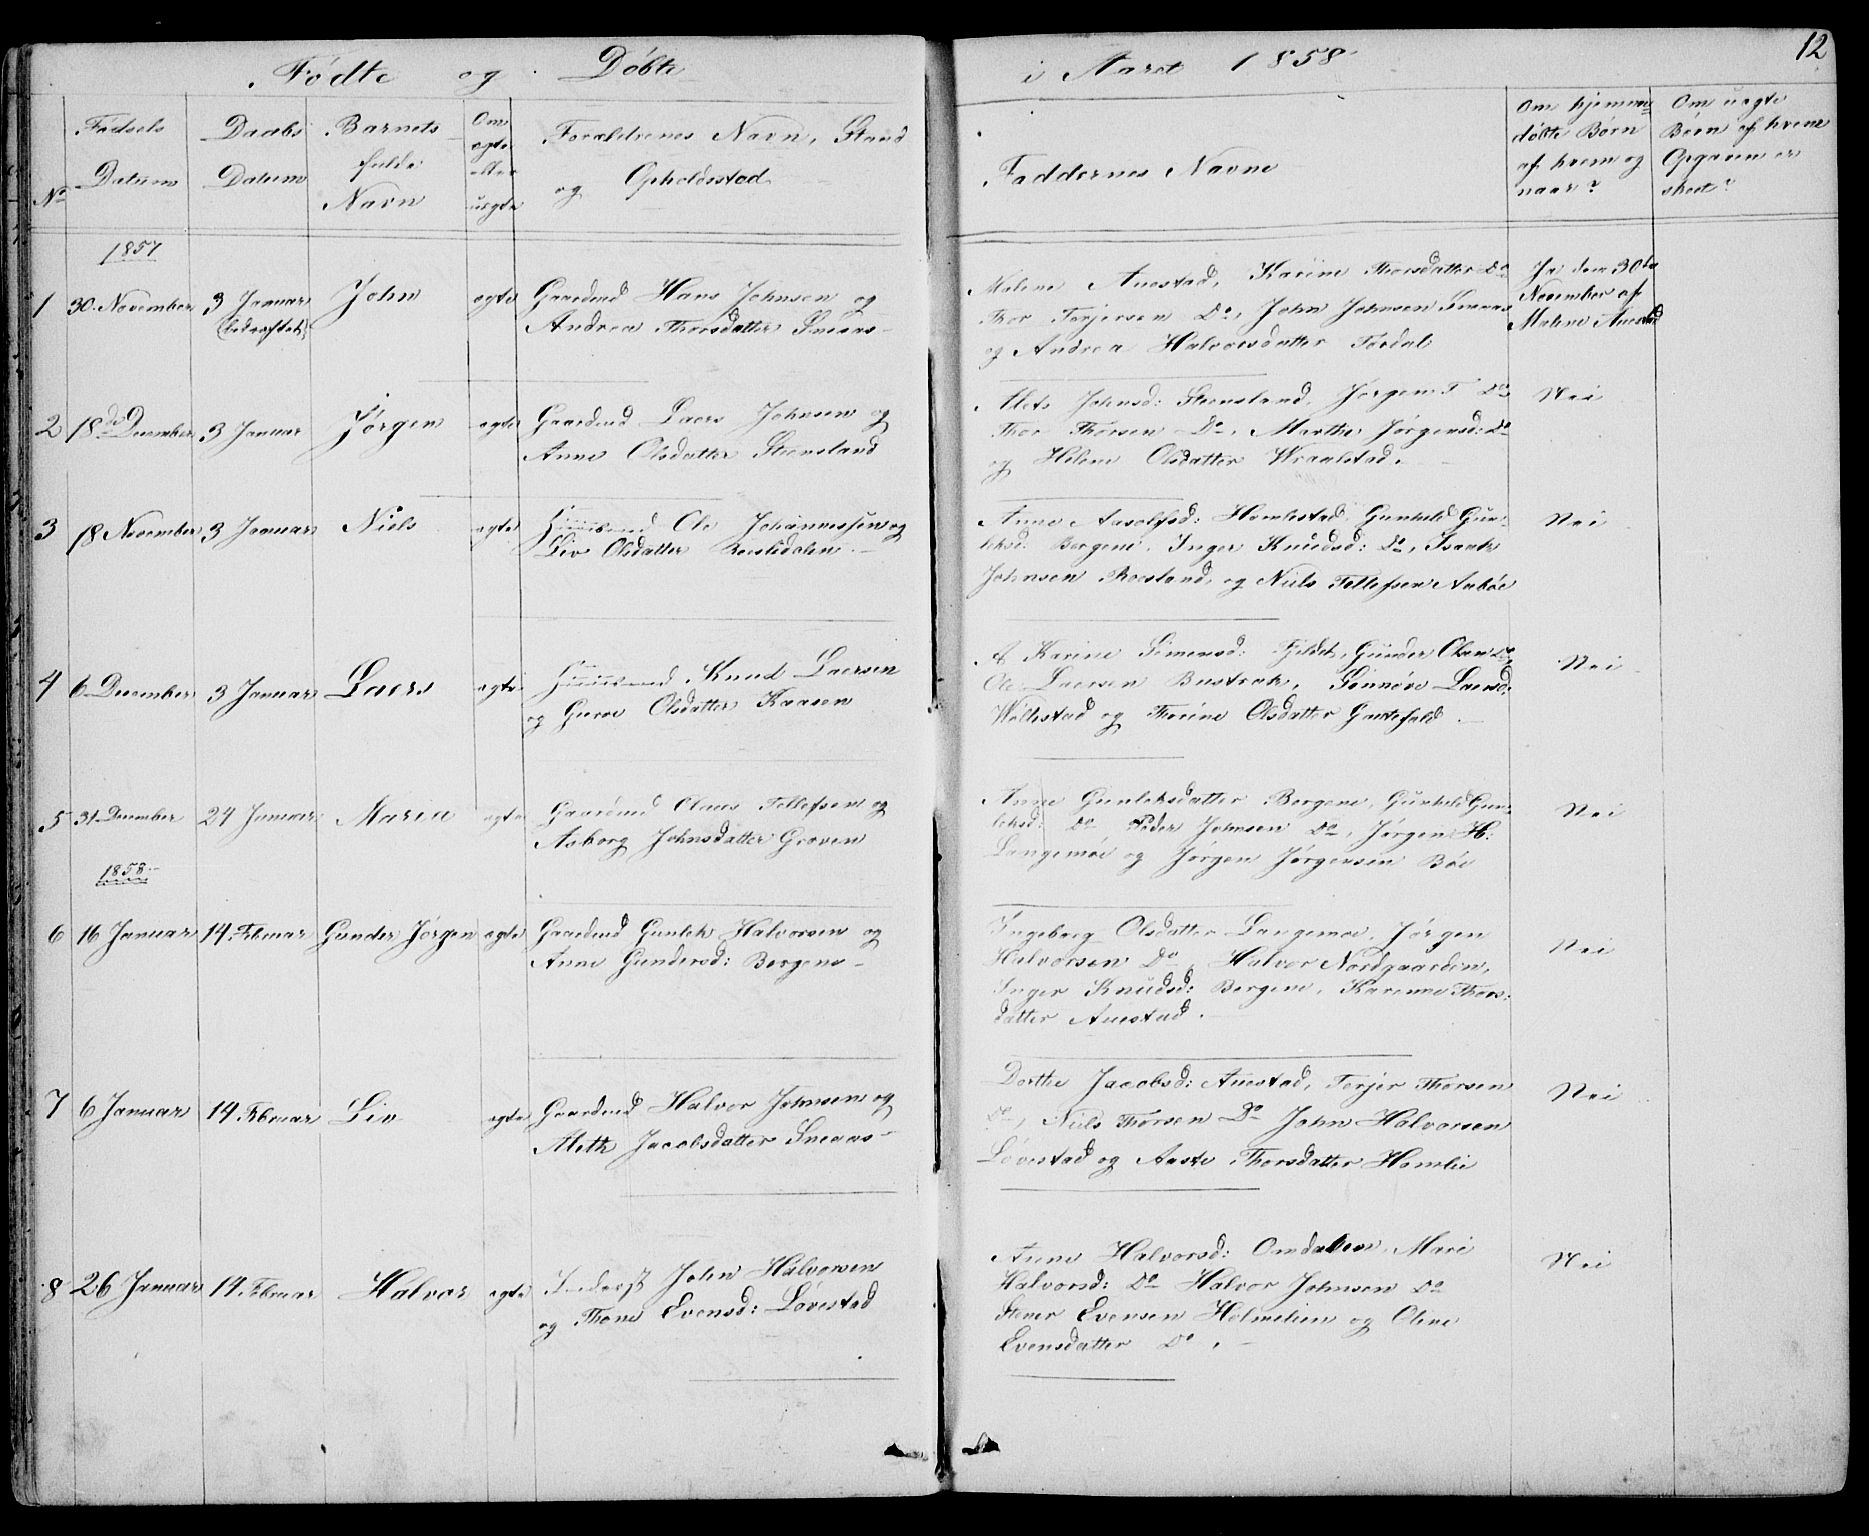 SAKO, Drangedal kirkebøker, G/Gb/L0001: Klokkerbok nr. II 1, 1856-1894, s. 12